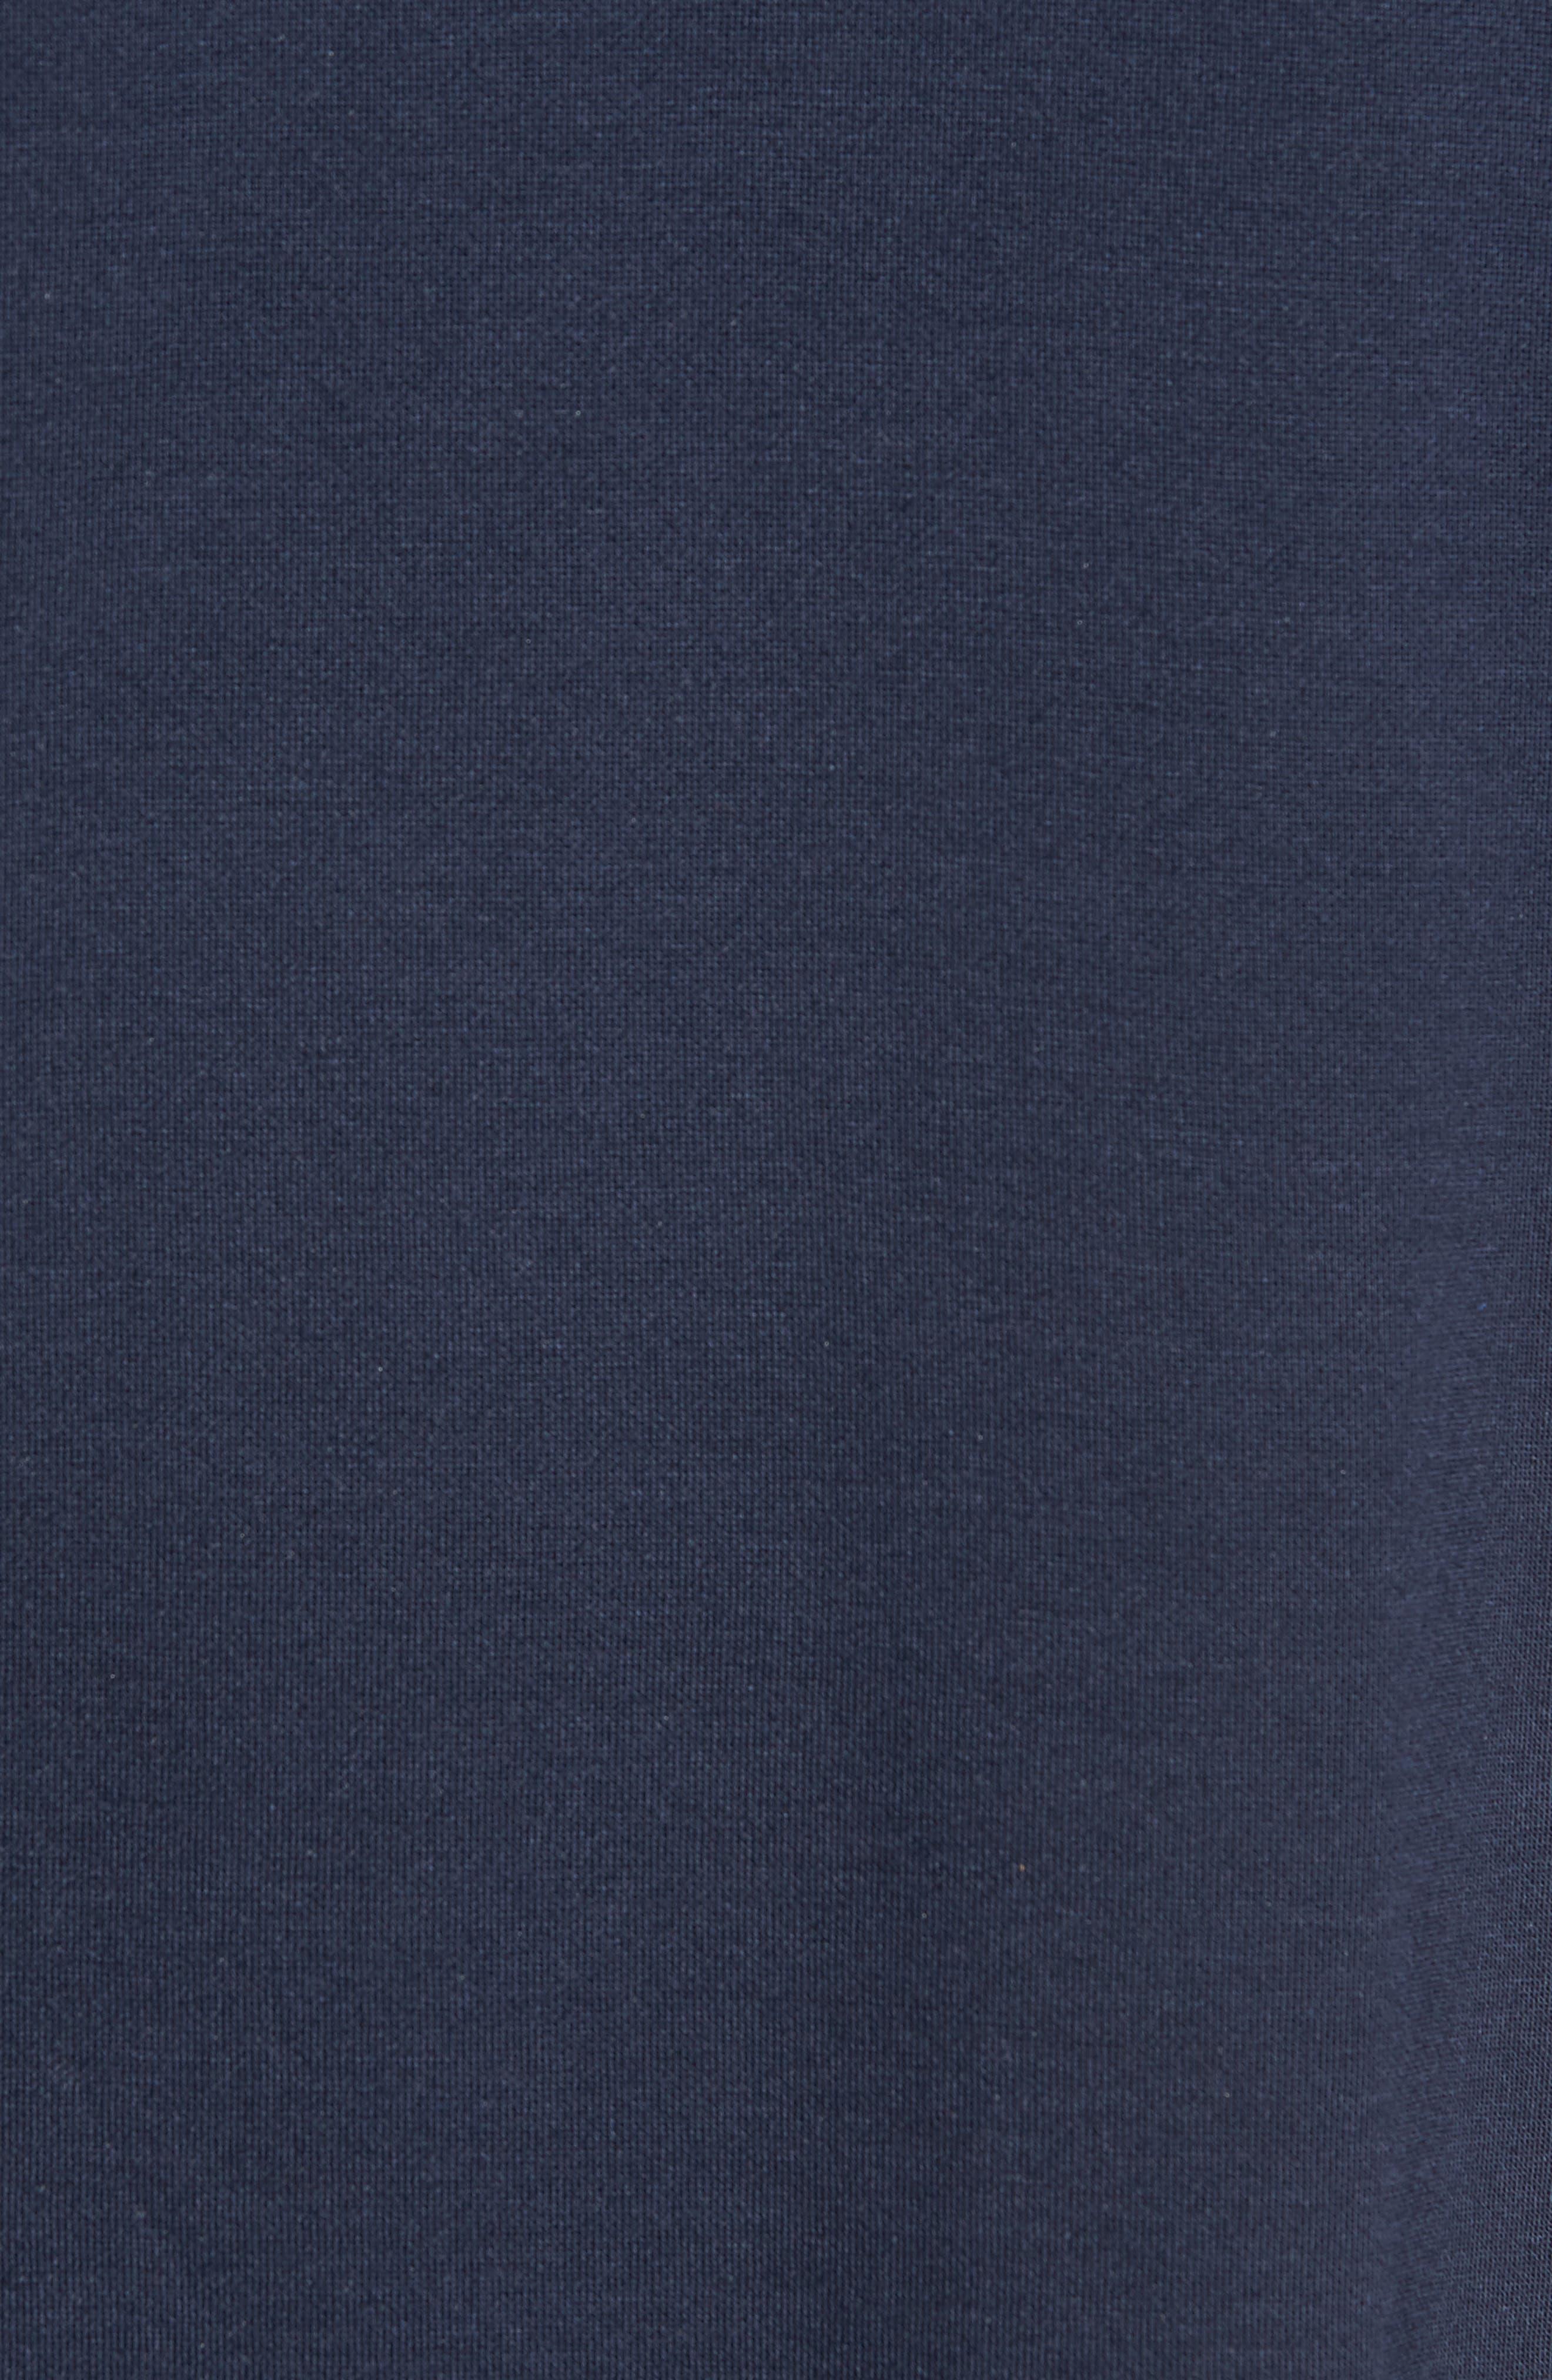 Trim Fit Colorblock Short Sleeve Polo,                             Alternate thumbnail 5, color,                             400